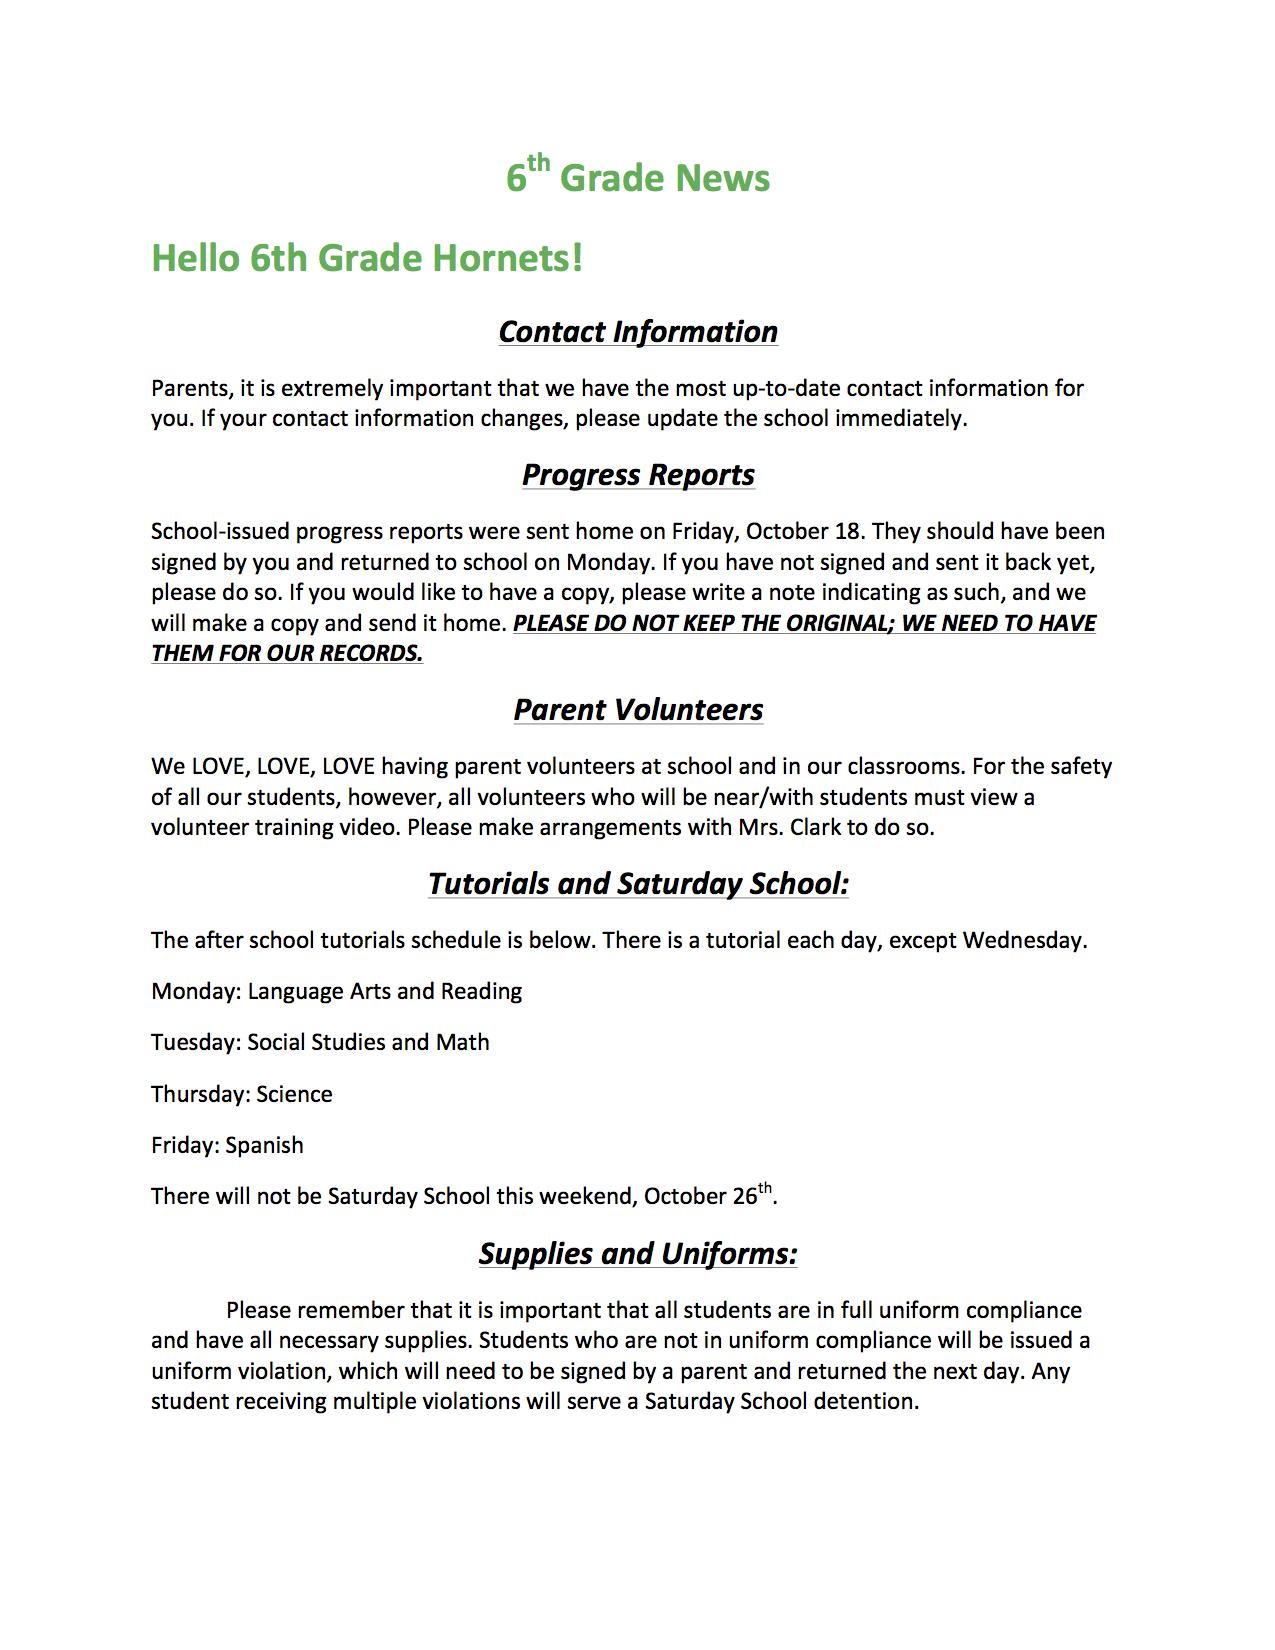 6th grade newsletteroctA.png